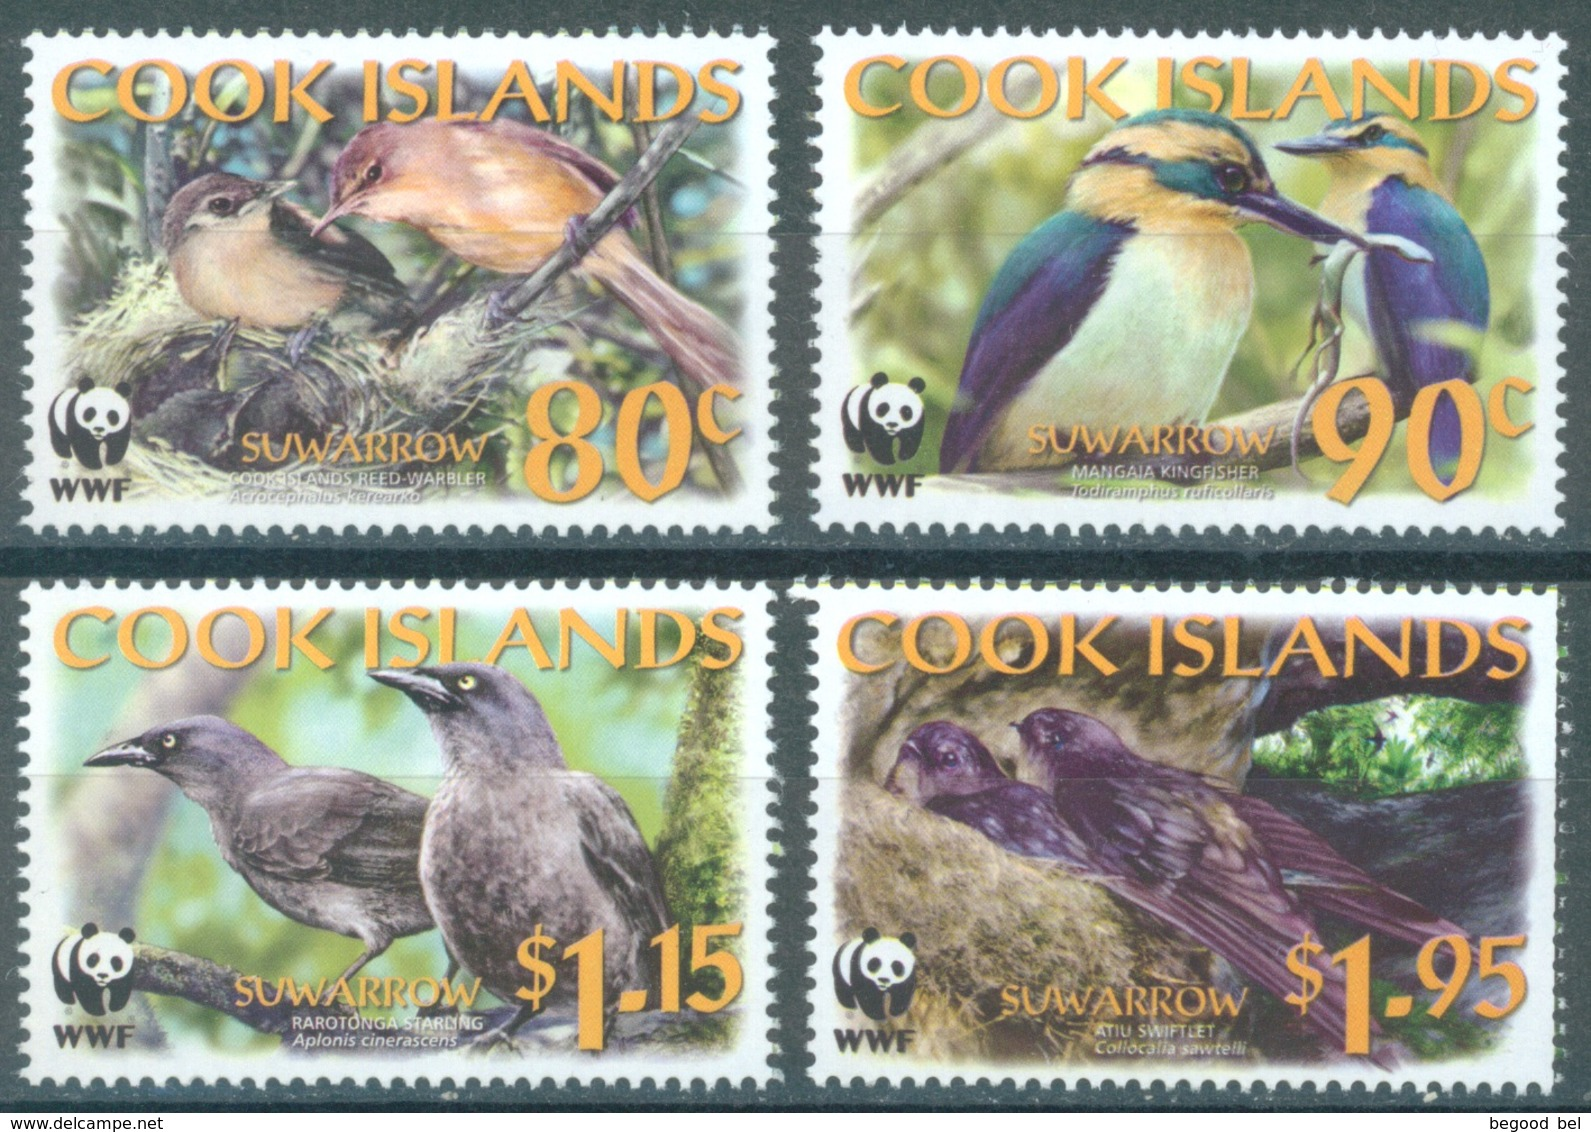 COOK  - 2005 - MNH/** - BIRDS WWF - Yv 1224-1227 Mi 1540-1543 - Lot 16812 - Cook